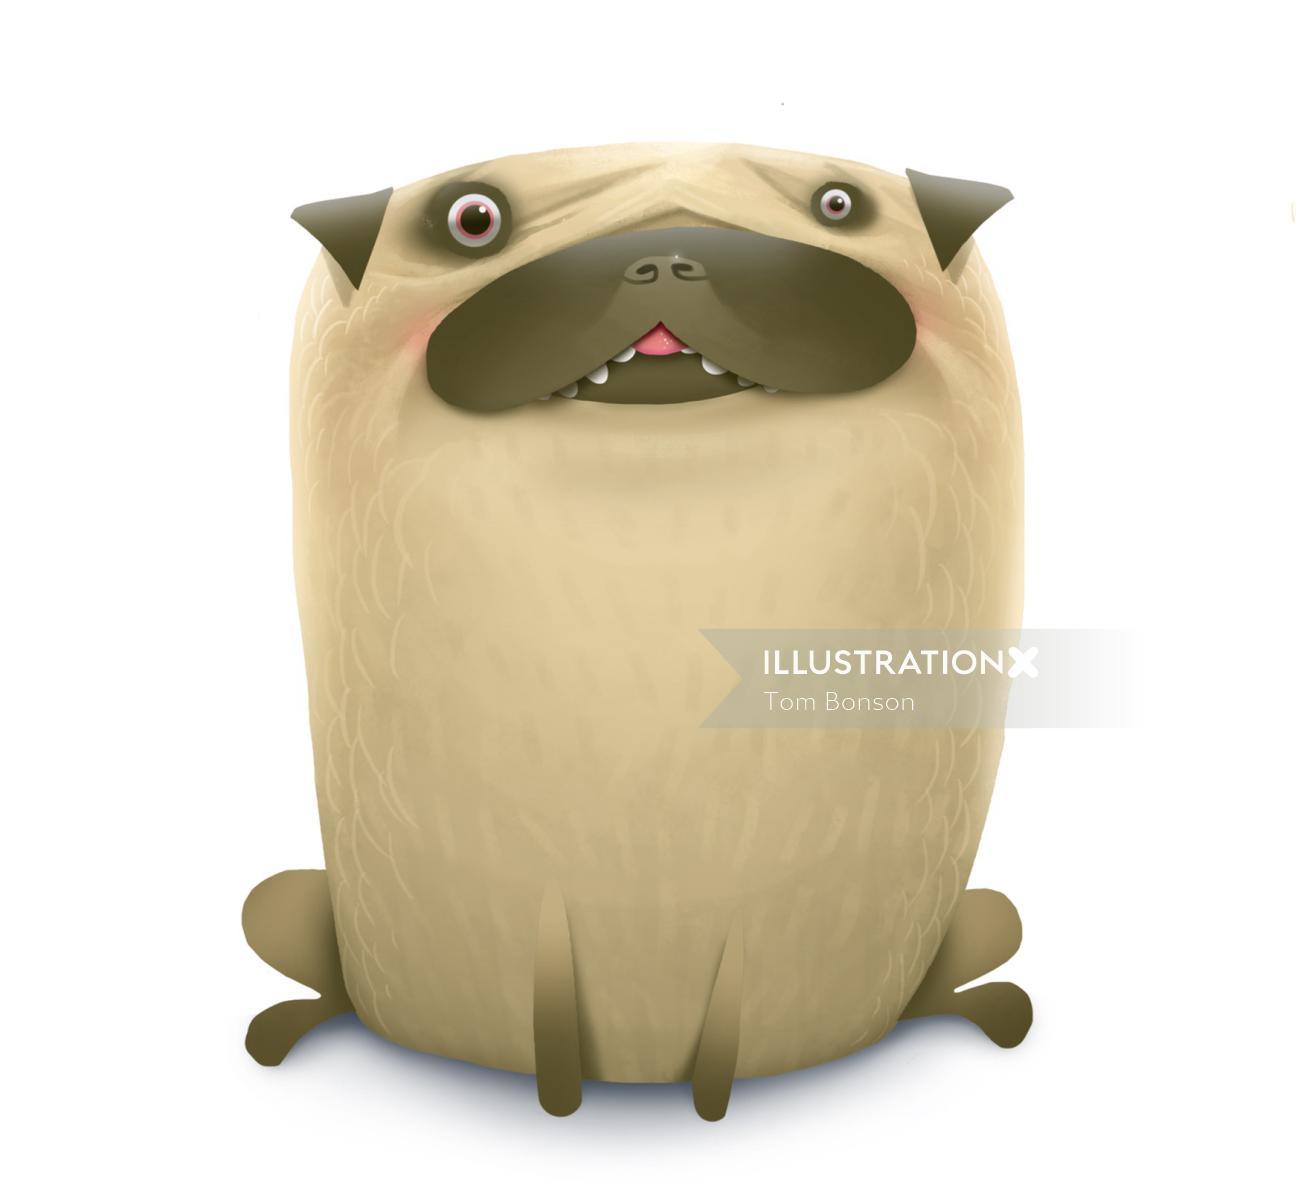 Animal character design by Tom Bonson